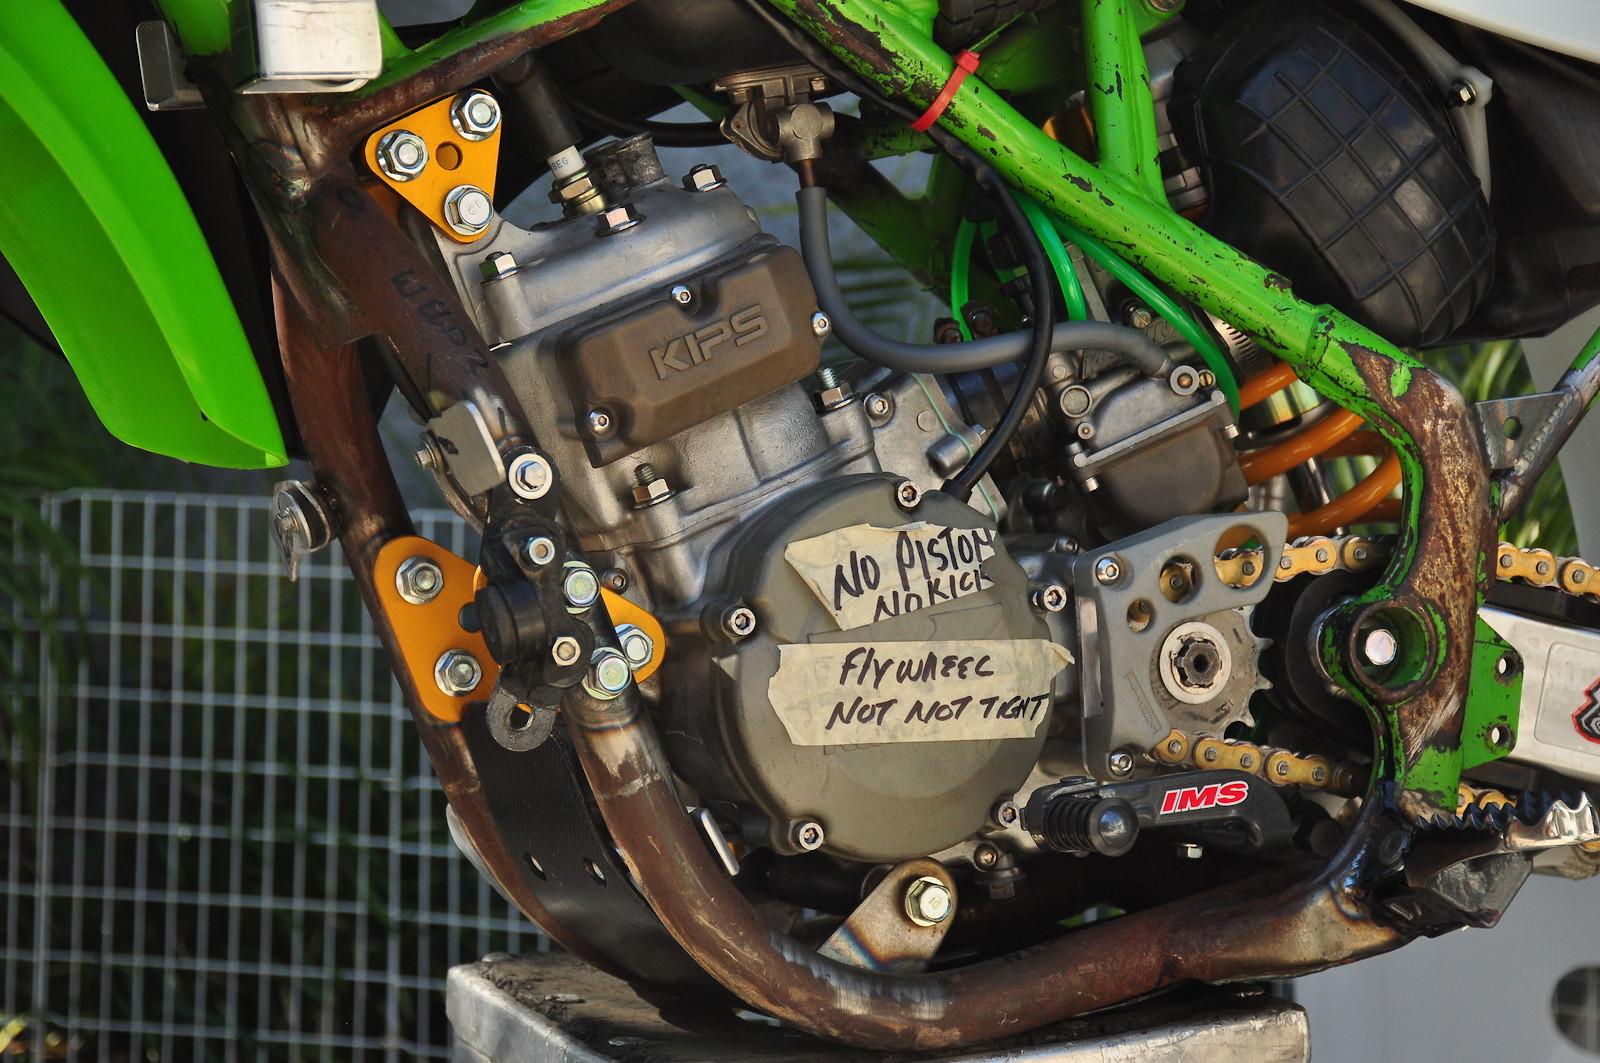 DSC 0006 - Copy - Mark_Chillzone - Motocross Pictures - Vital MX